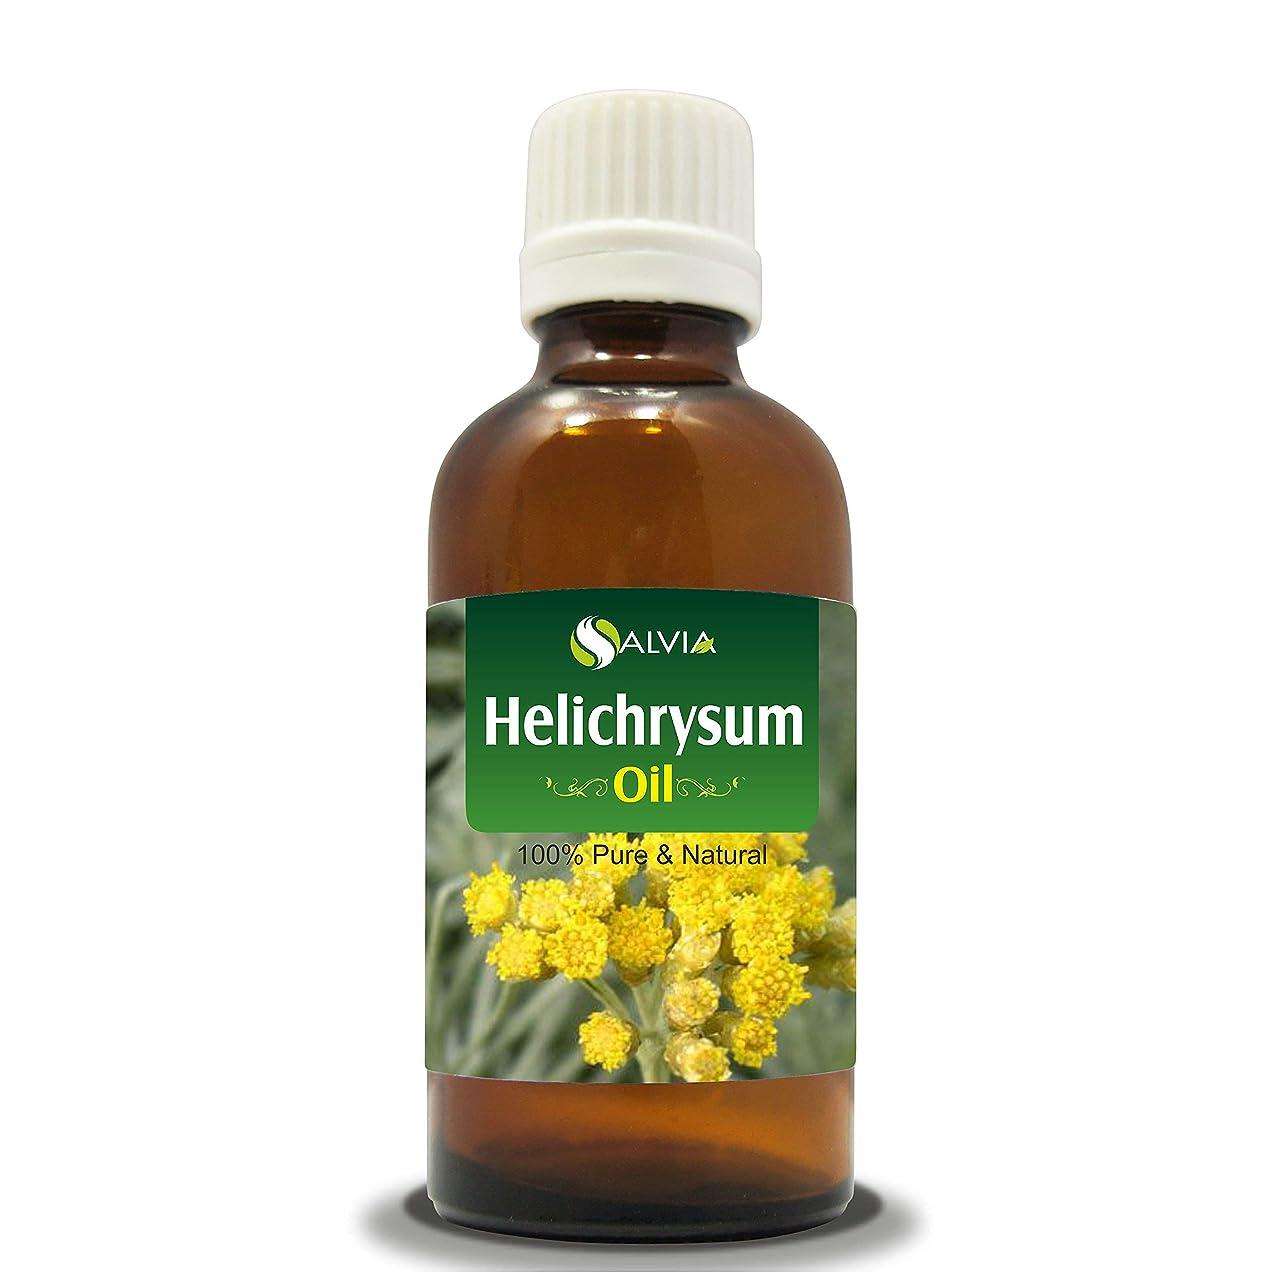 証明平行口述HELICHRYSUM OIL (HELICHRYSUM ITALICUM) 100% NATURAL PURE ESSENTIAL OIL 50ML